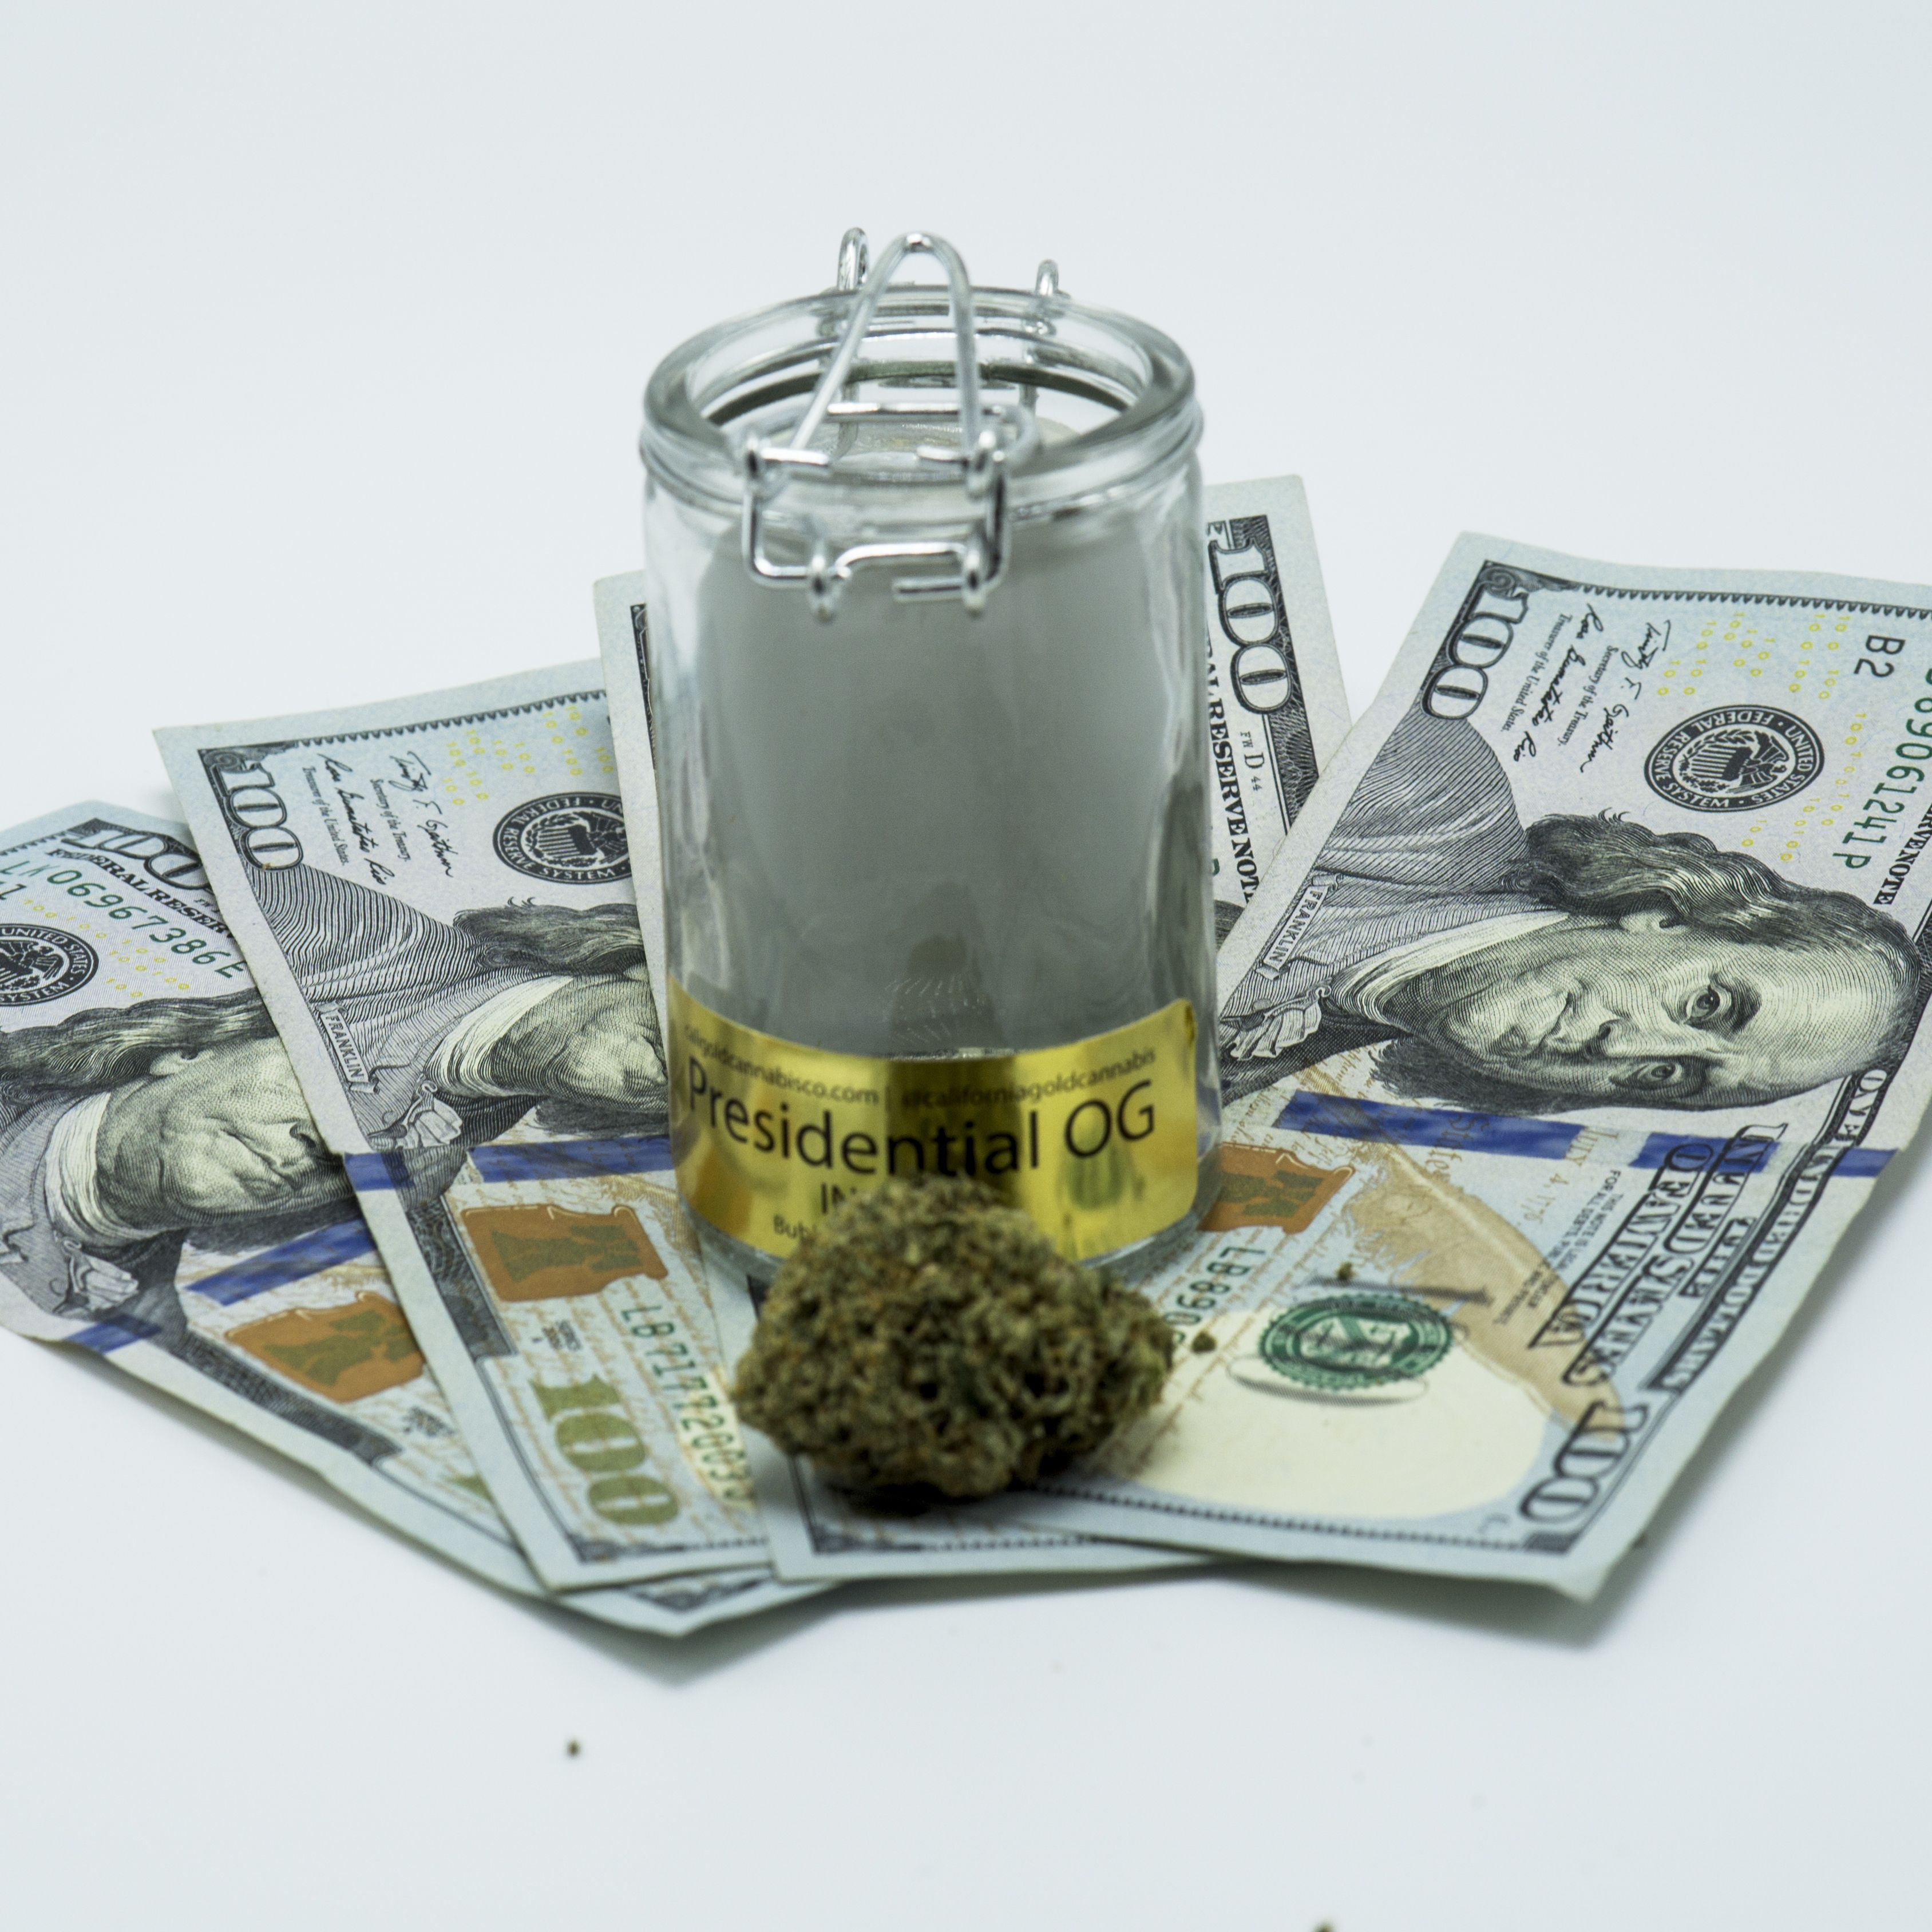 California Gold Cannabis Co. Presidential OG